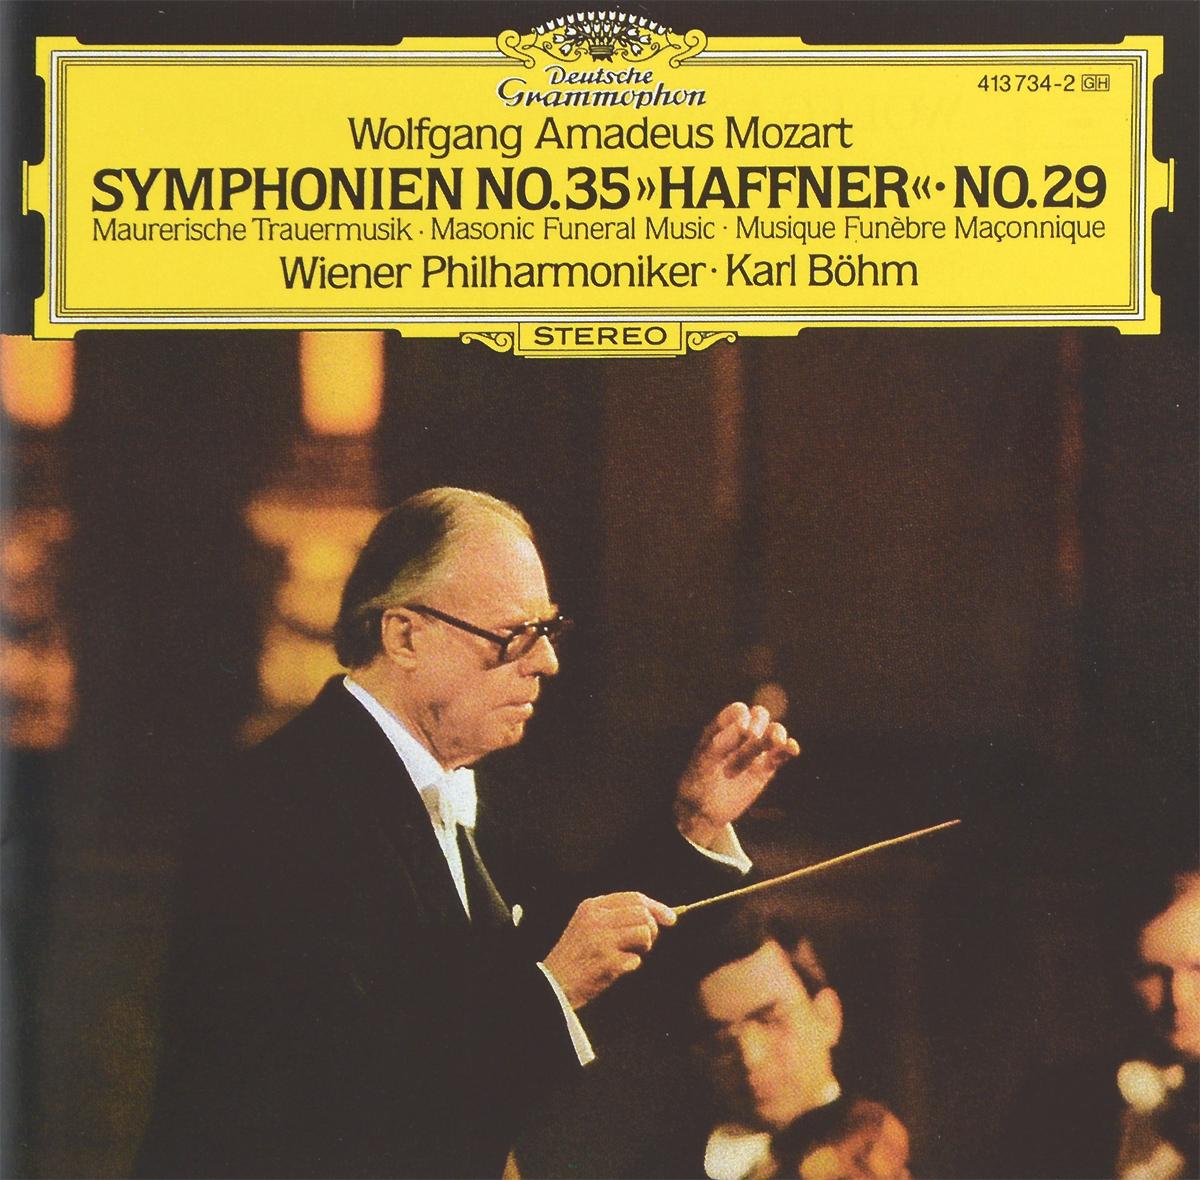 Карл Боэм,Wiener Philharmoniker Karl Boehm. Wolfgang Amadeus Mozart. Symphonien No. 35 Haffner / No. 29 карл боэм karl boehm mozart the abduction from the serail 2 cd